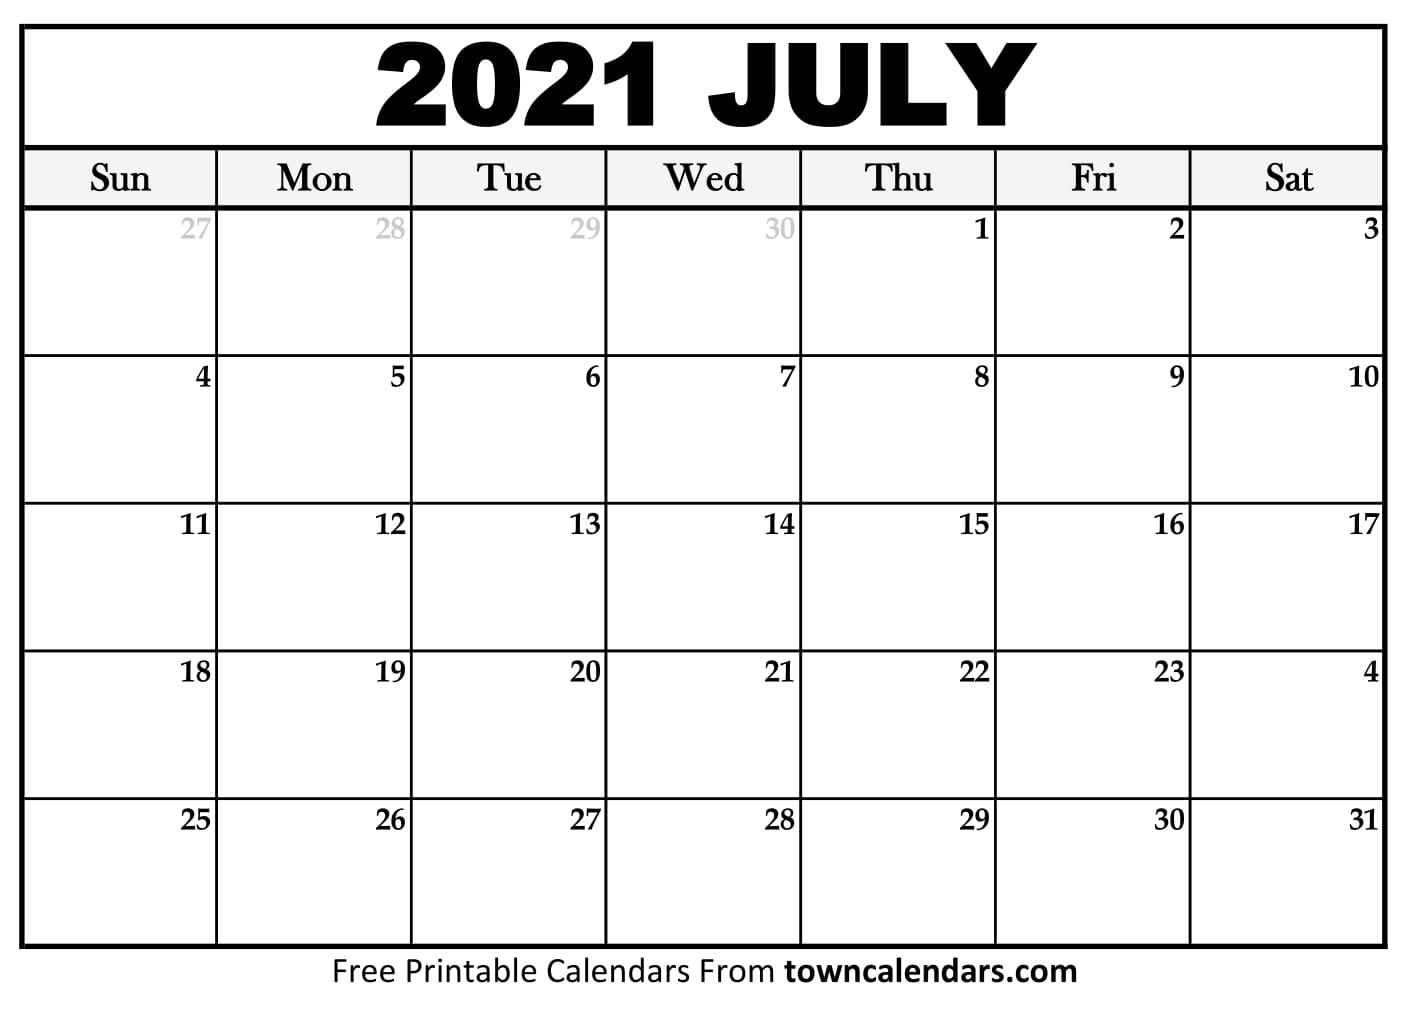 Calendar 2021 July Printable